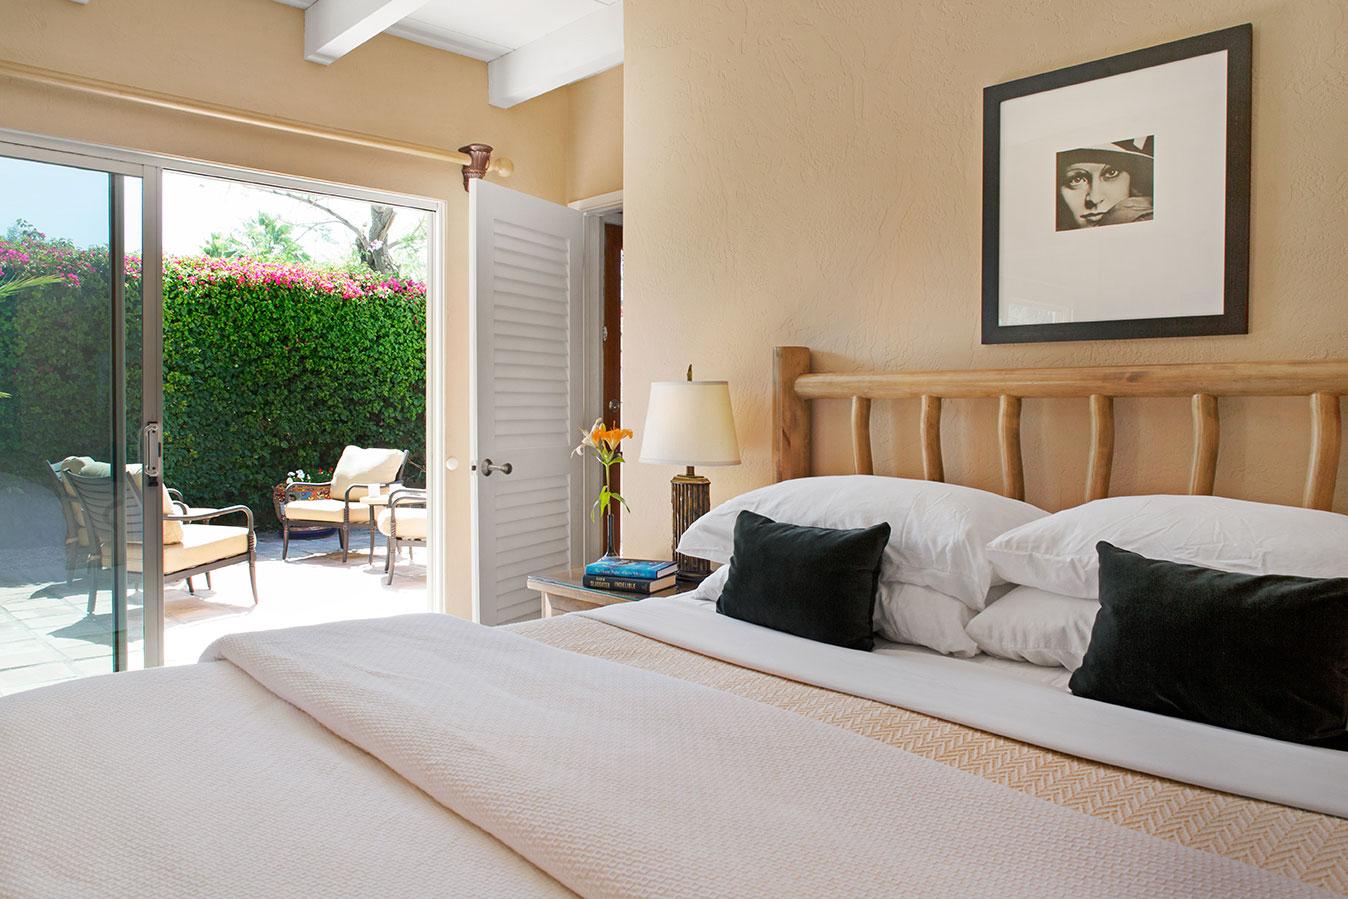 Grand Deluxe Suite bedroom at The Hacienda Gay Resort